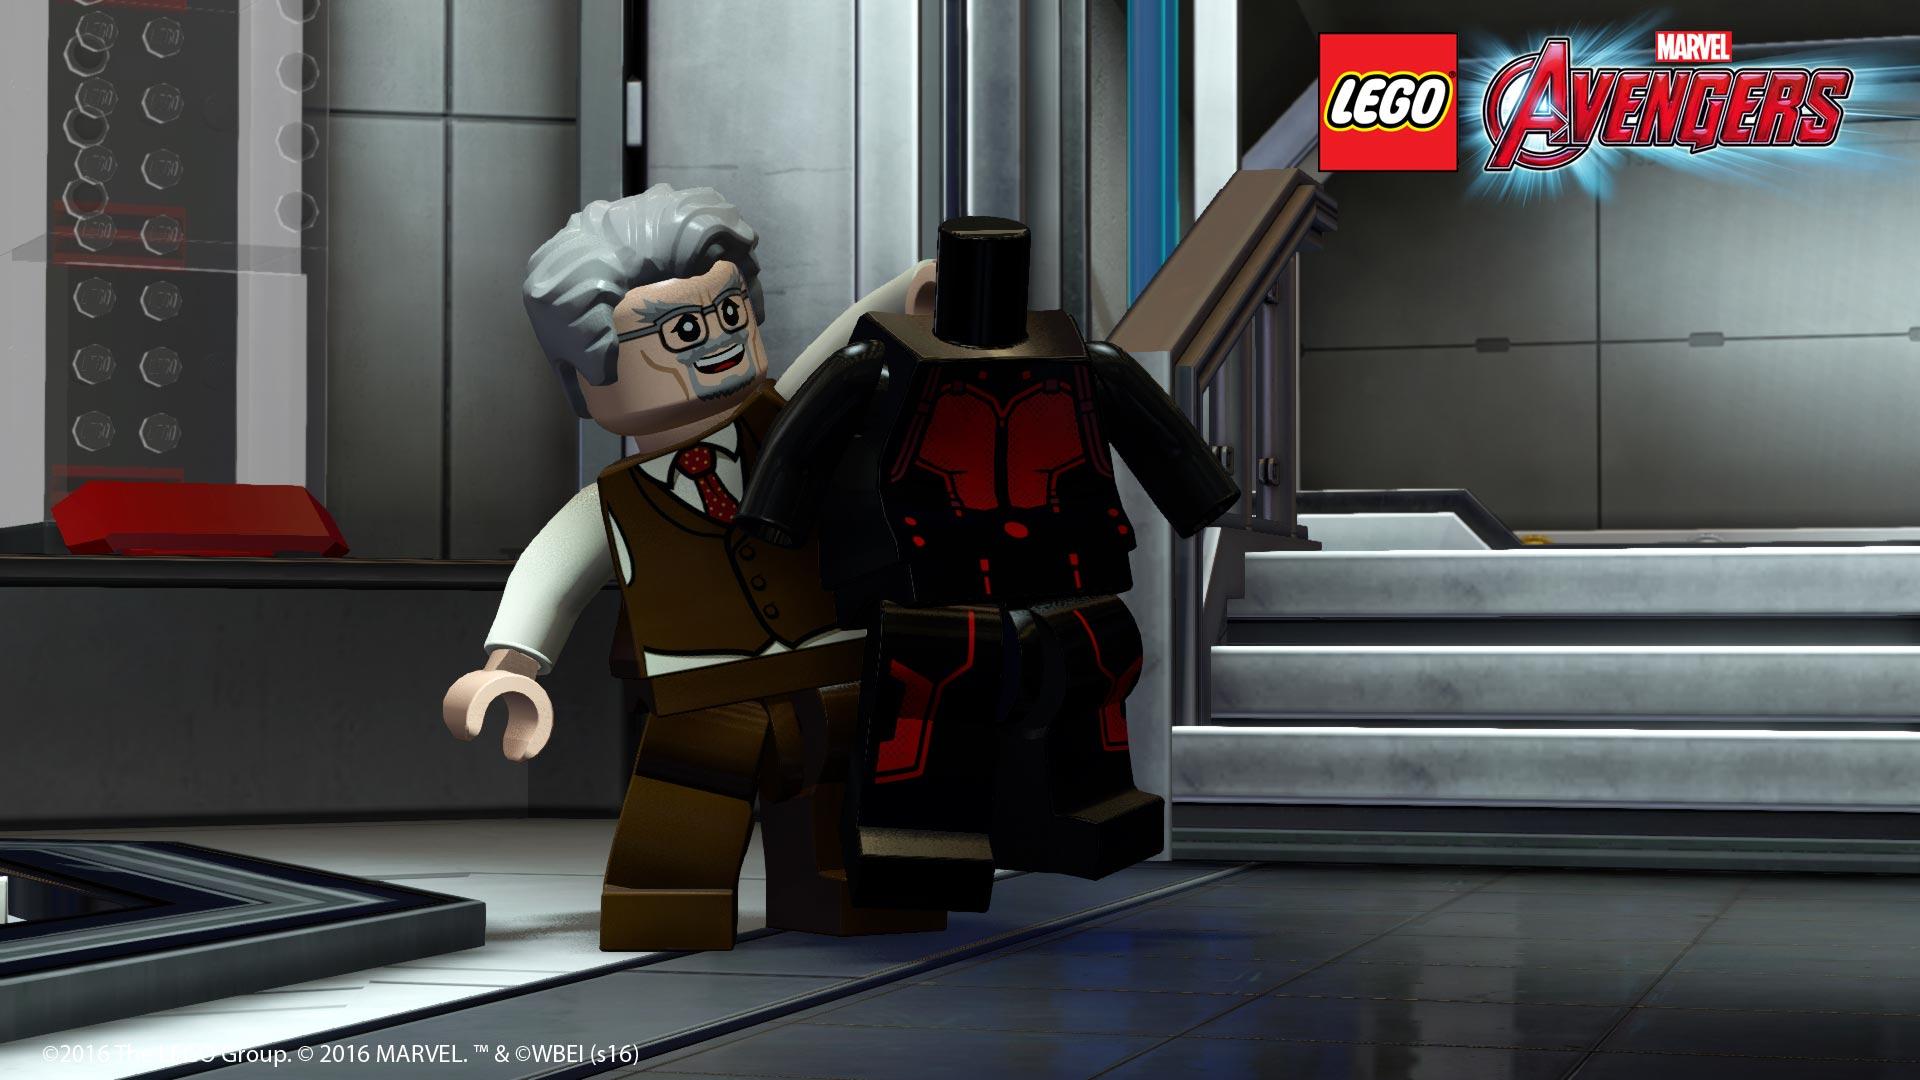 Microsoft Wallpaper Fall Lego Marvel Avengers Ant Man Dlc Available For Free